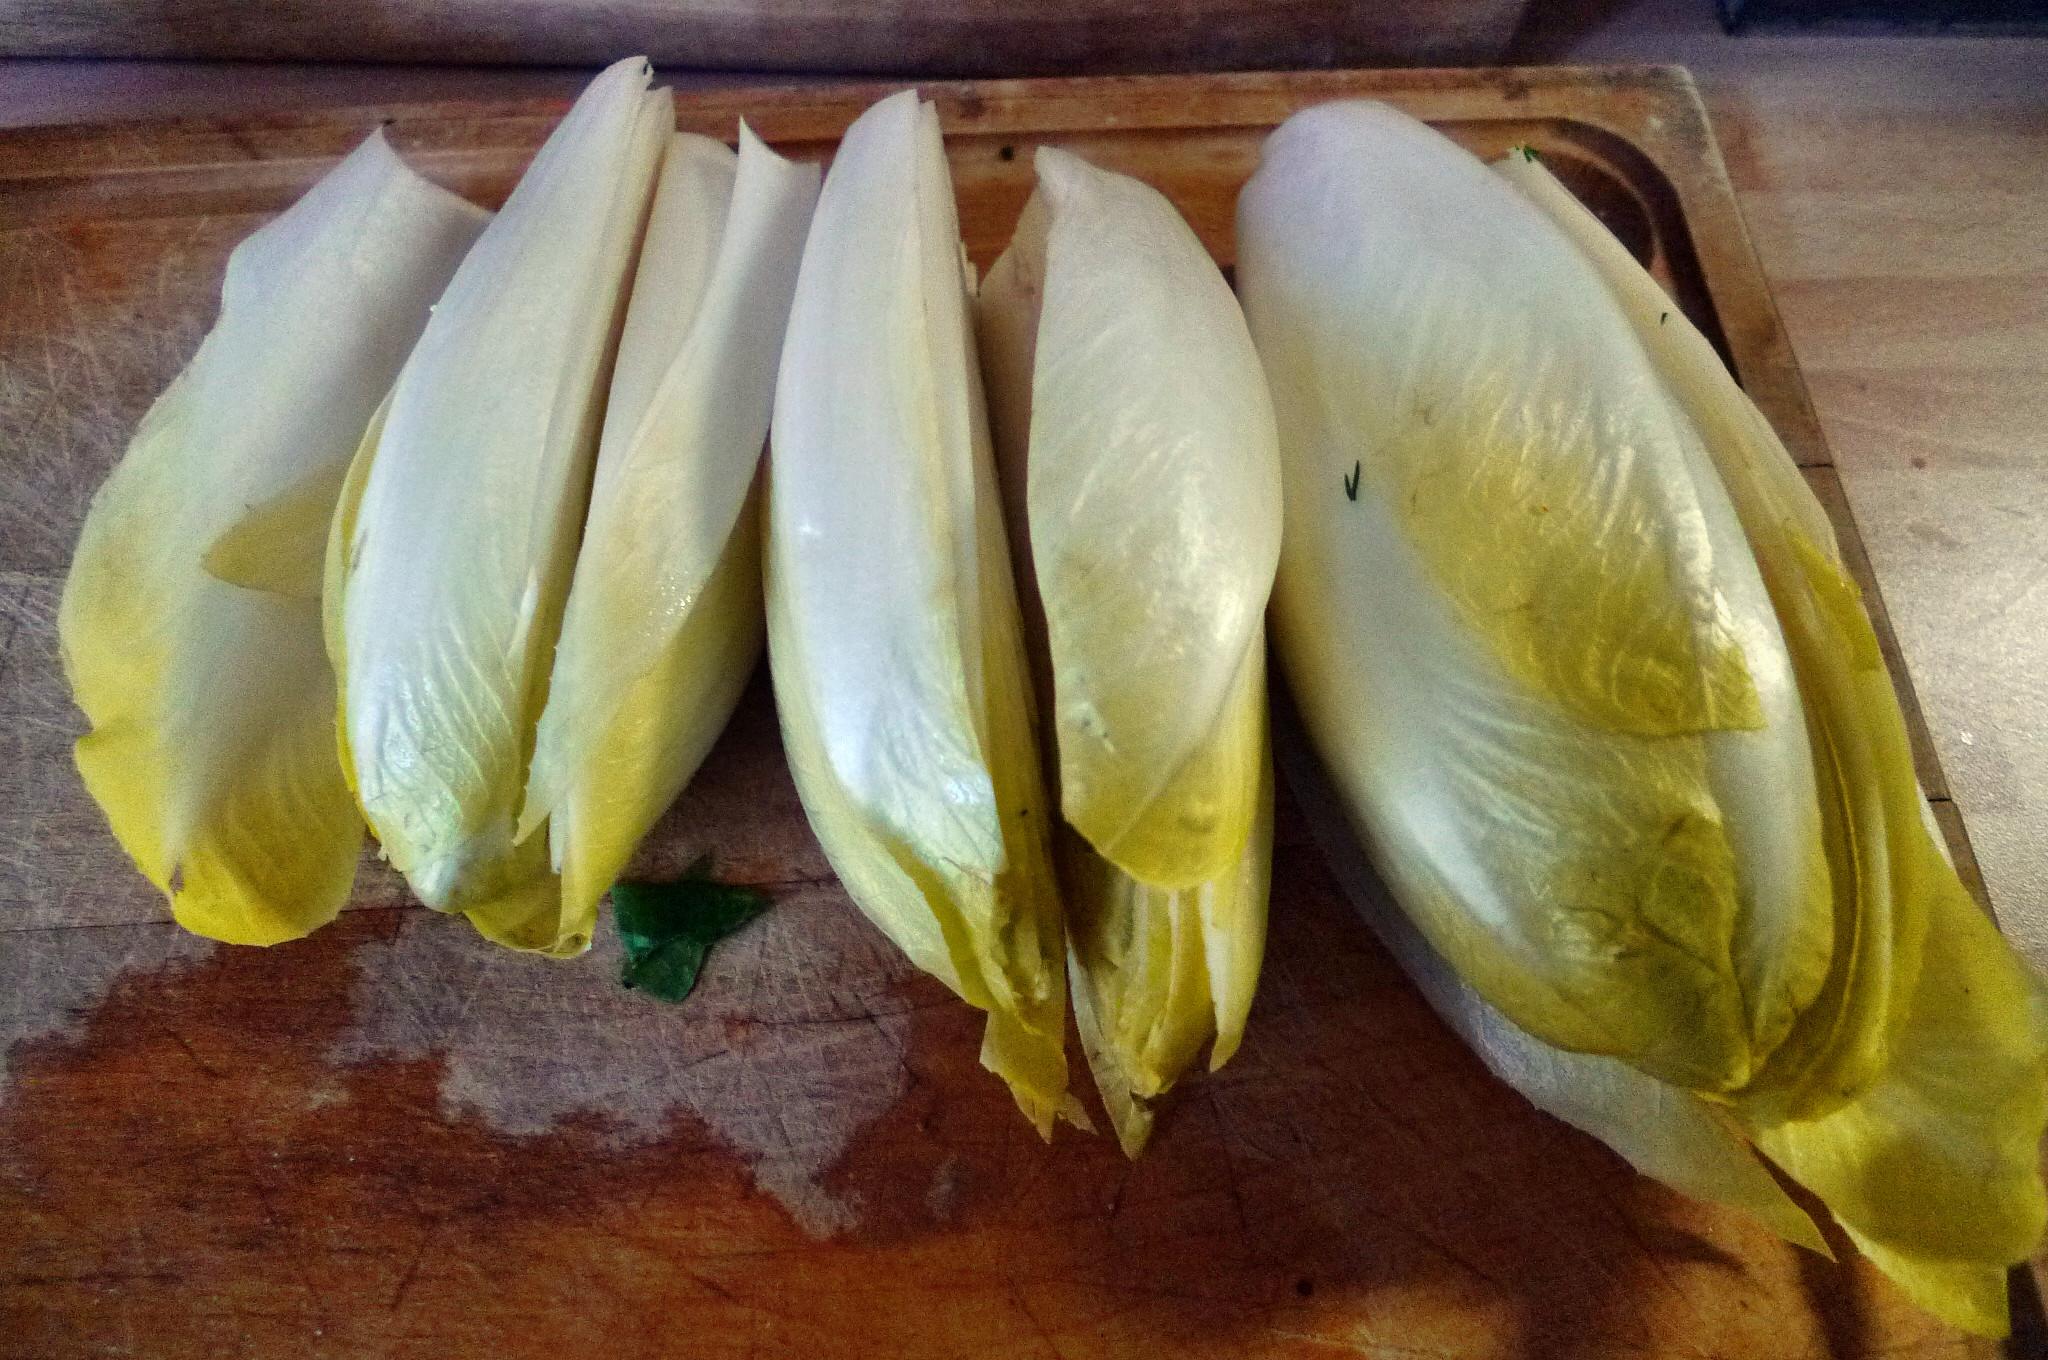 Klöße,Pilzsauce,Salate-8.2.15   (10a)